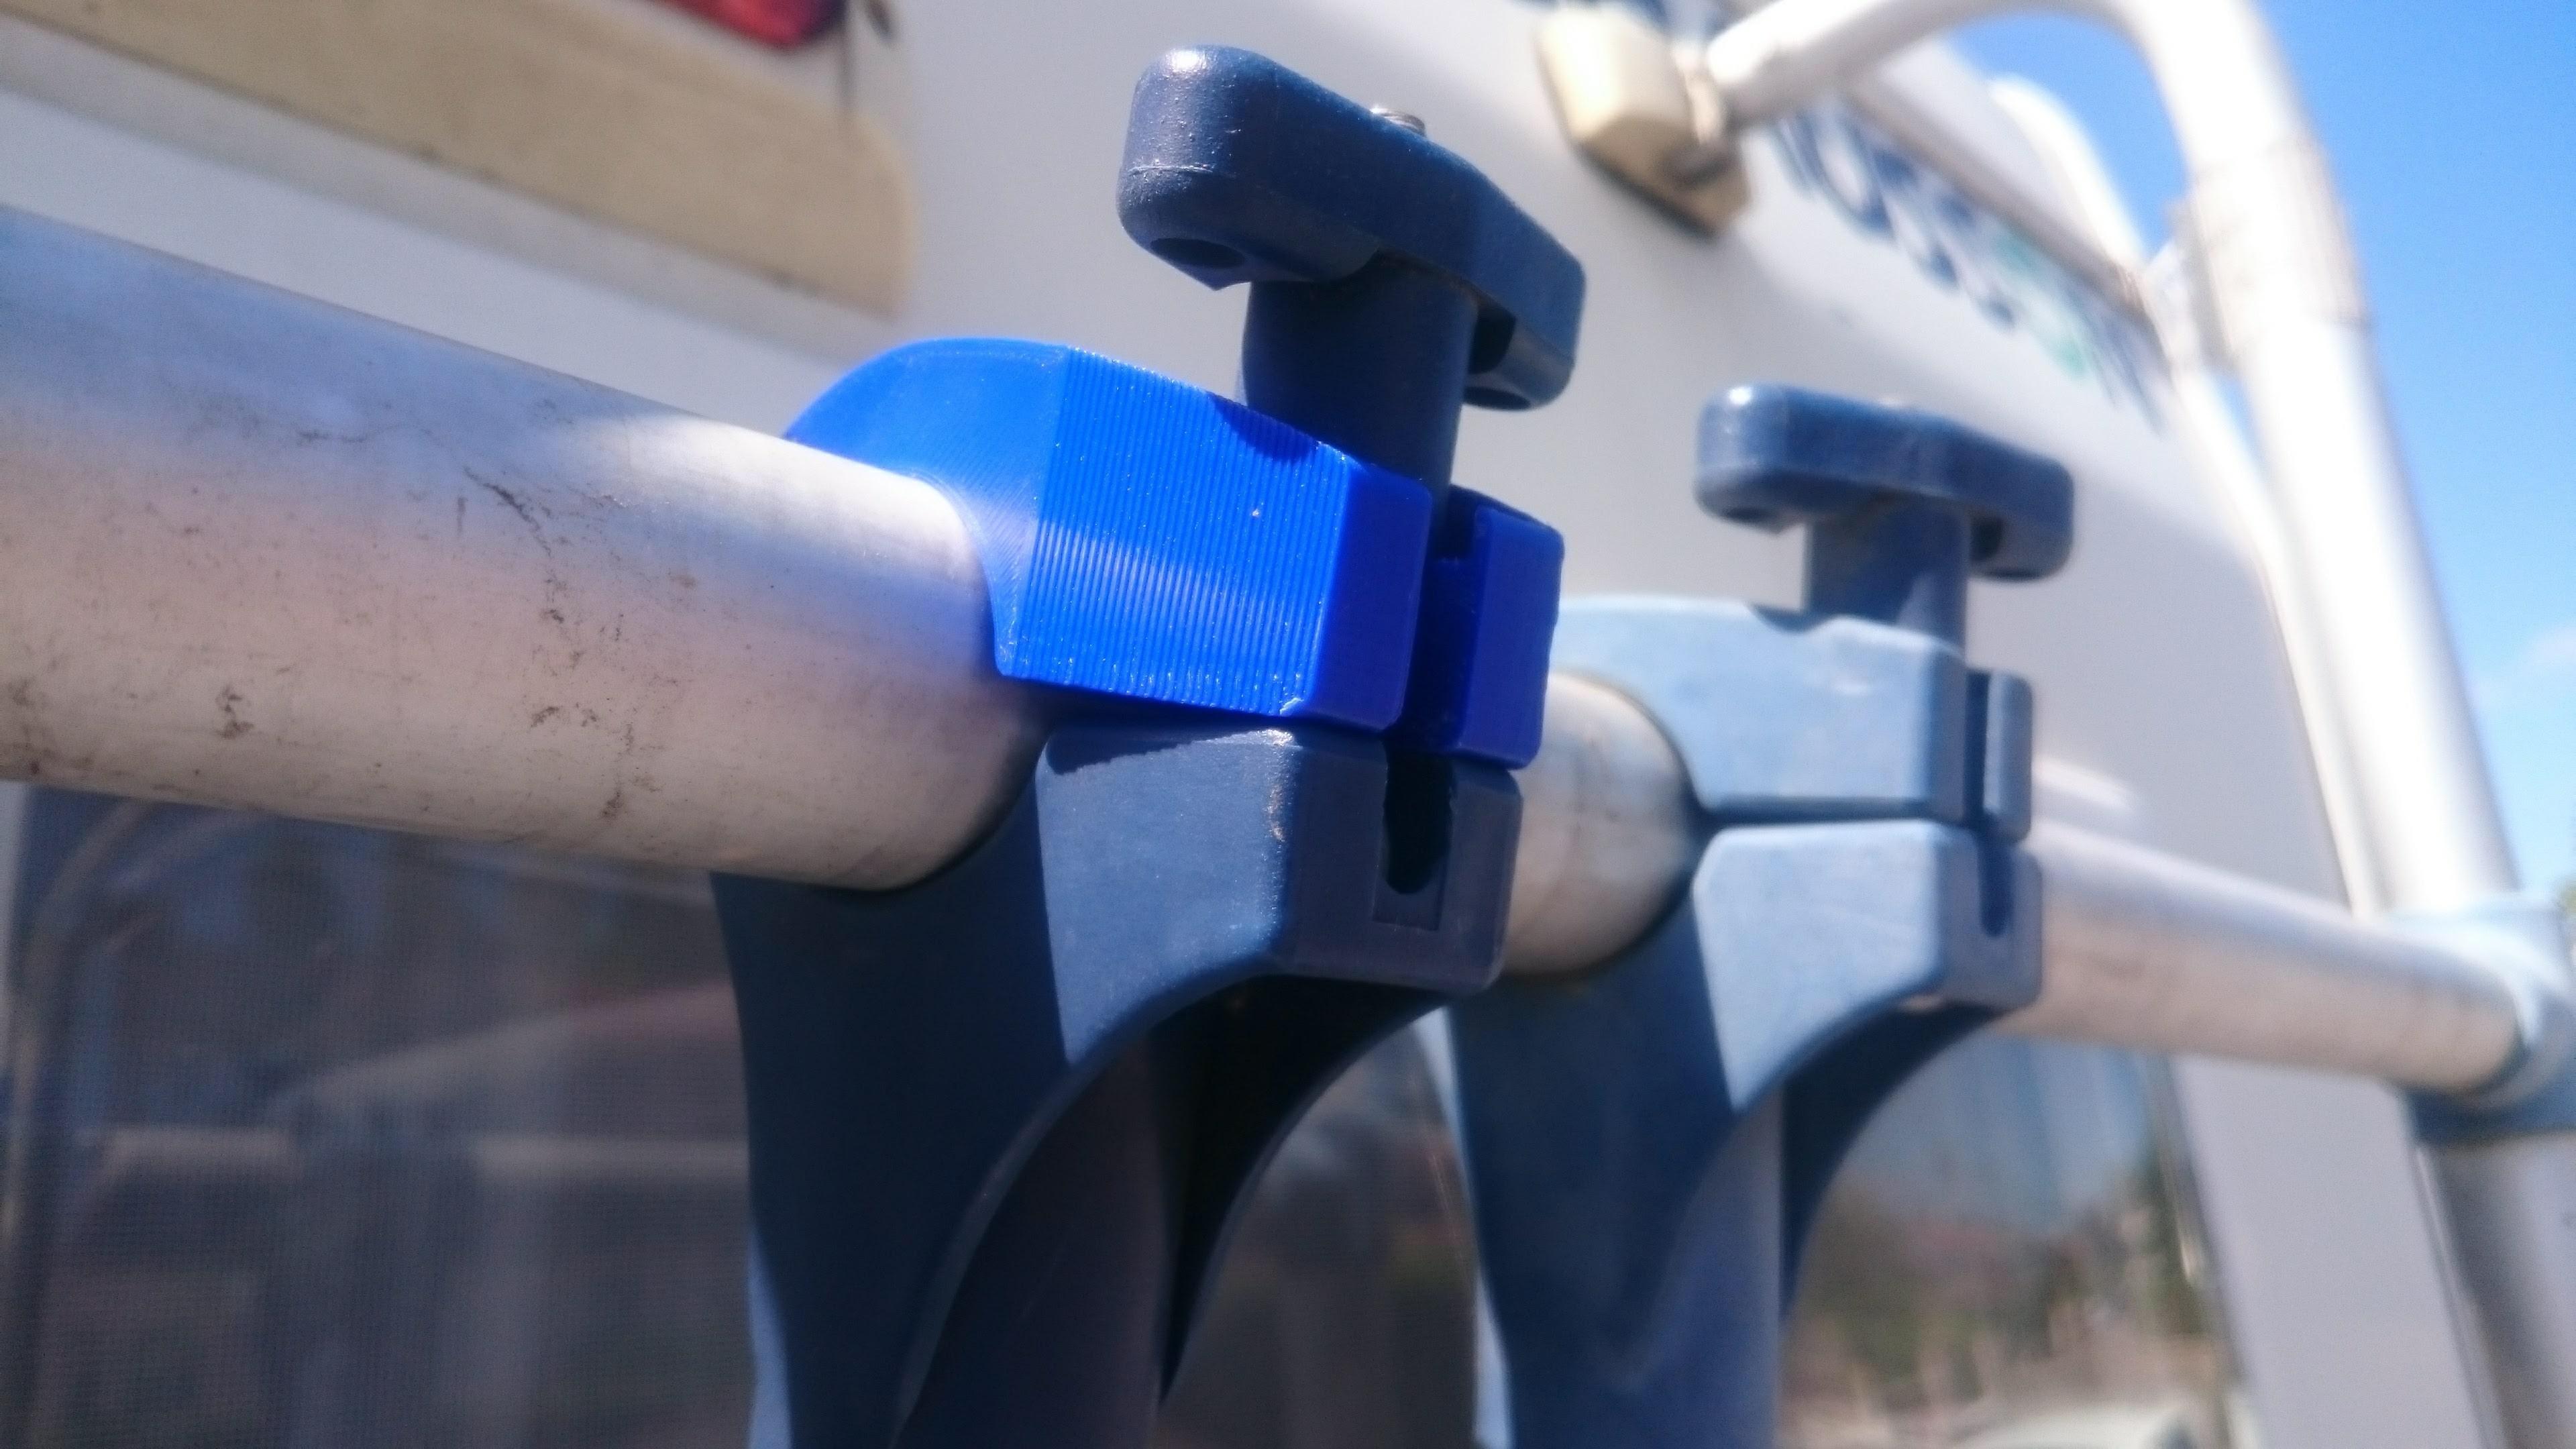 Piece support velo.jpg Download free STL file Parts Bike carrier for motorhomes • 3D printer model, Ldom21